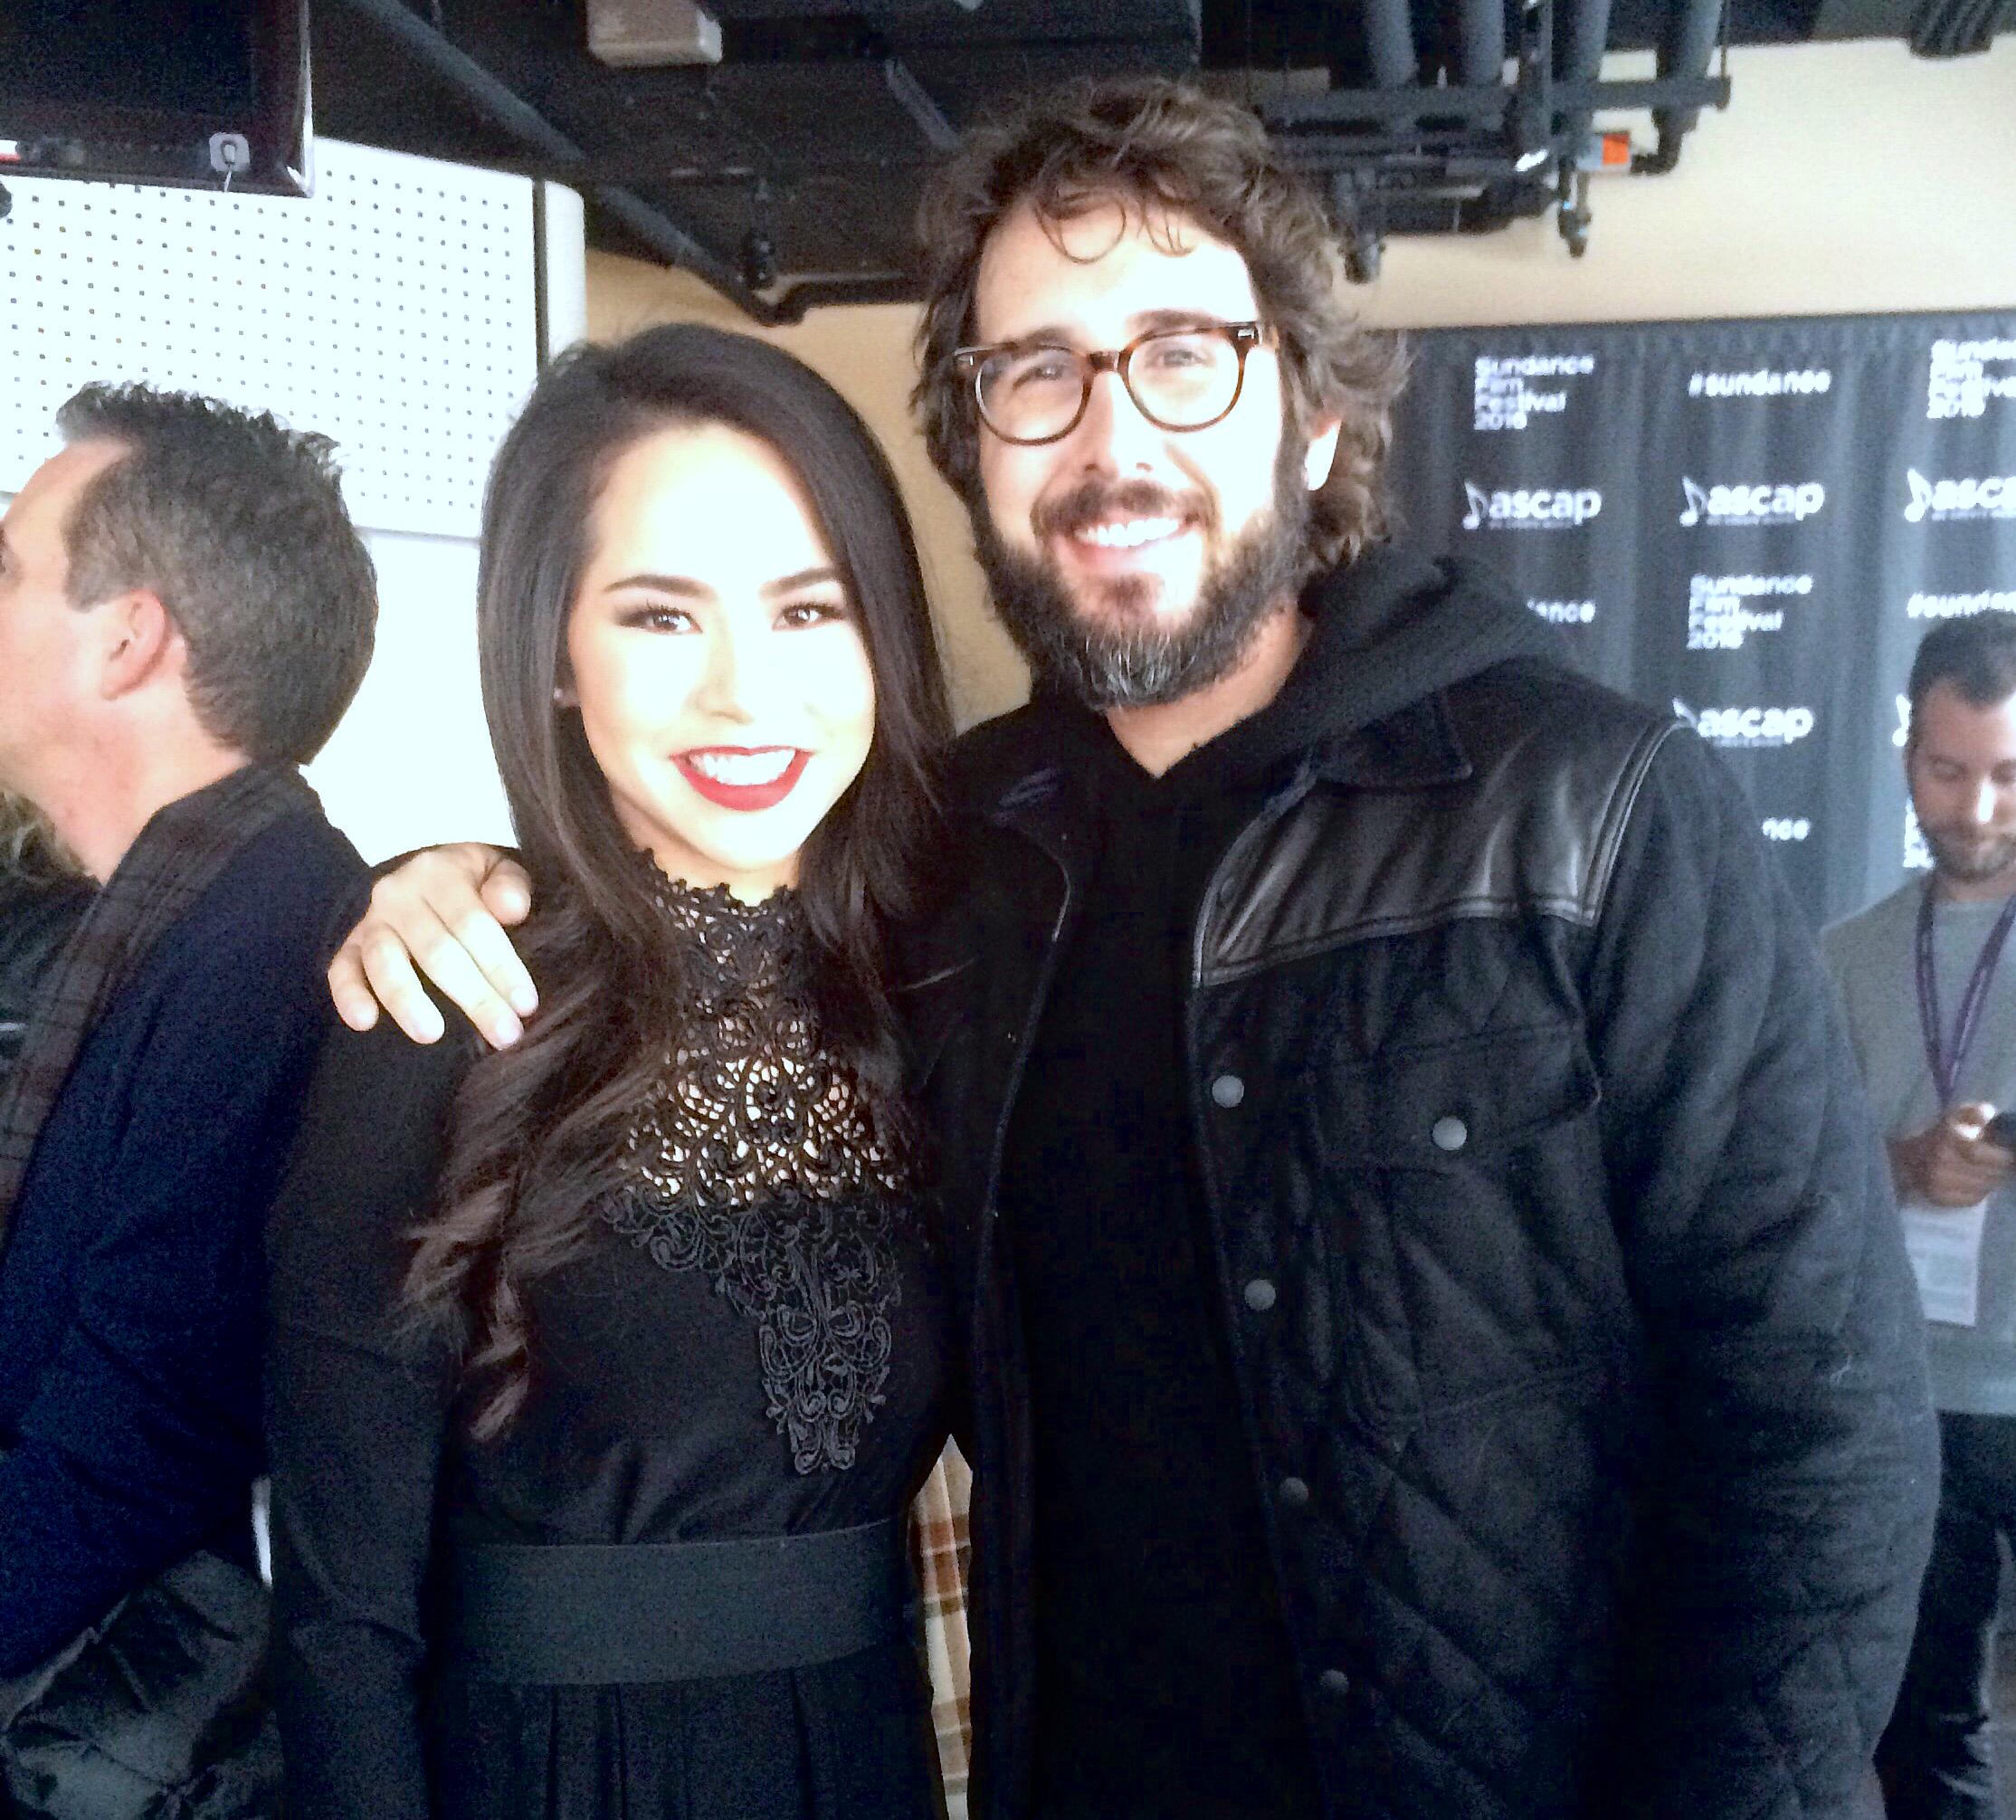 Meeting Josh Groban post-performance with Yoshiki at the Sundance Film Festival  January 2016  · Park City, UT